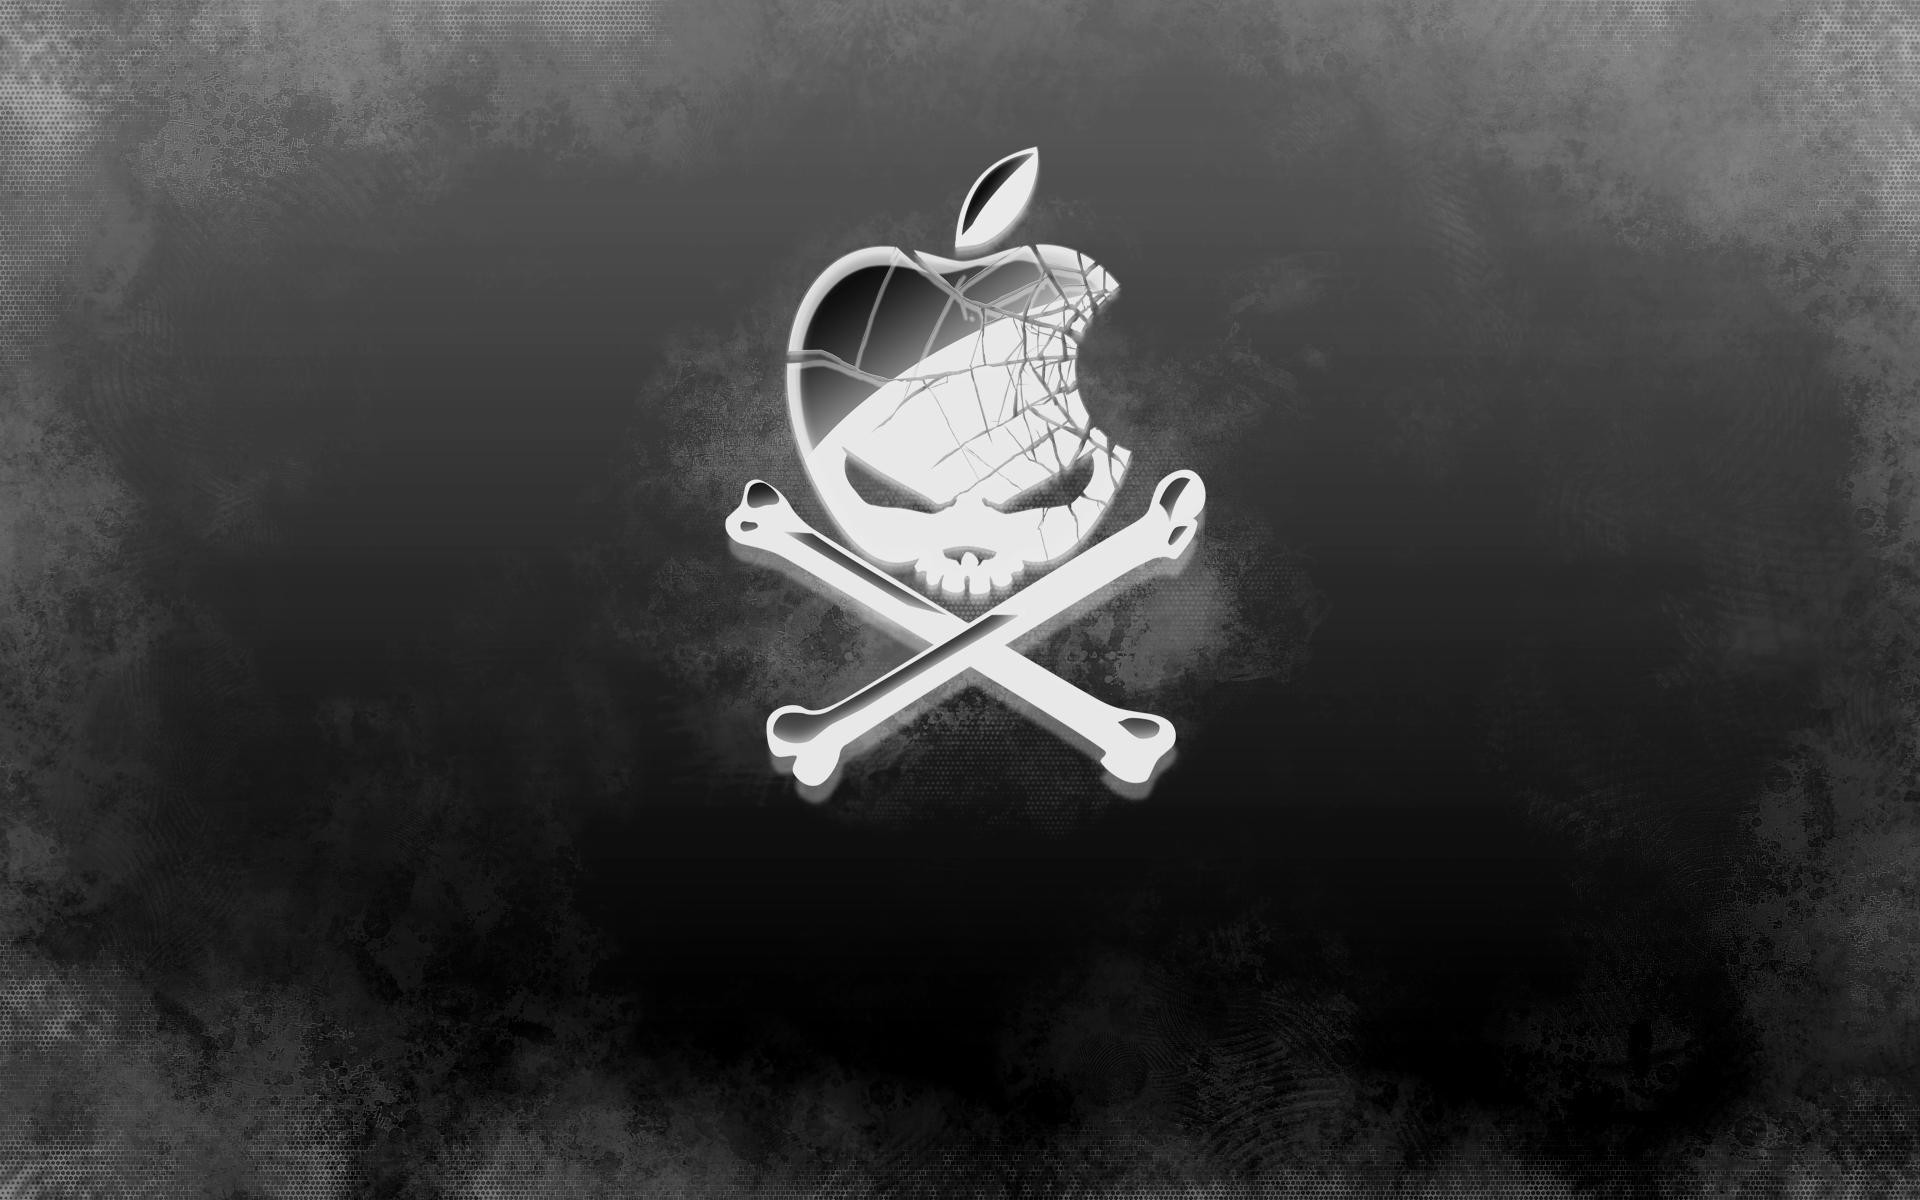 Cool apple logo wallpaper wallpapertag - Cool logo wallpapers ...